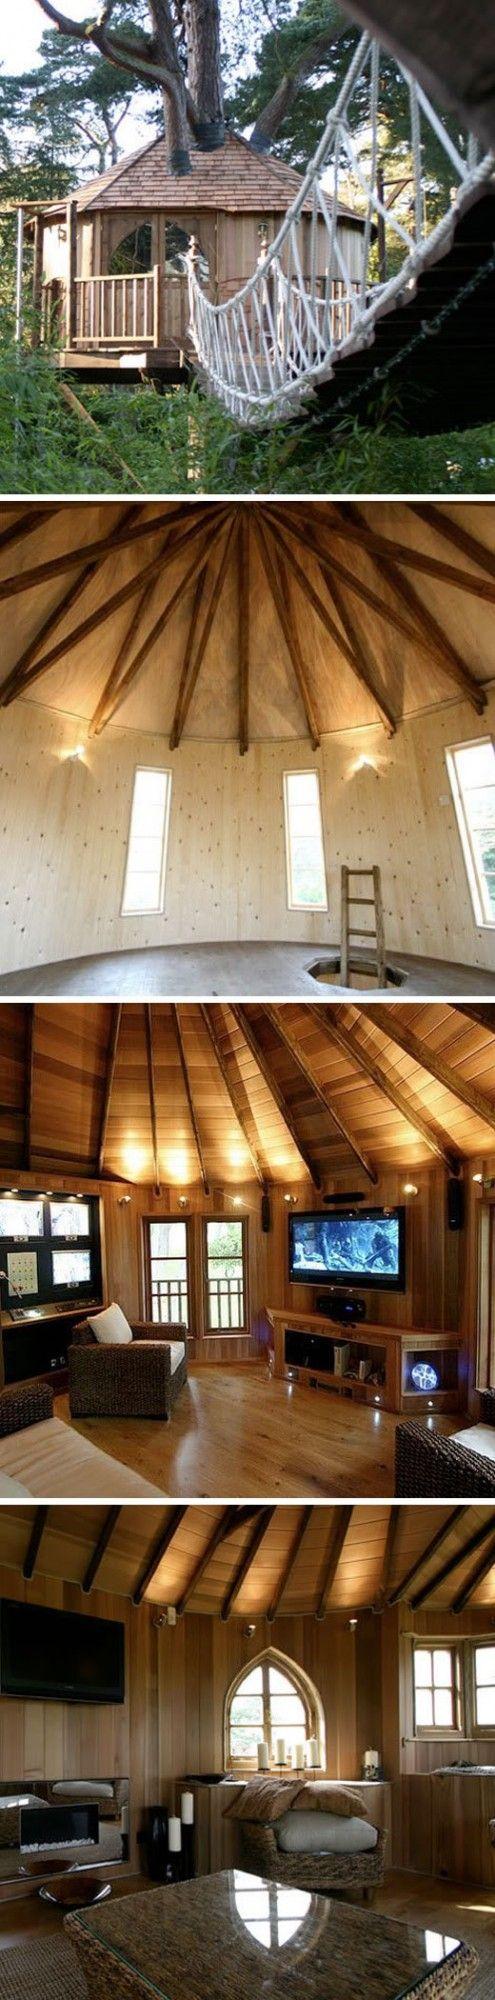 Best 25+ Tree house decor ideas on Pinterest | Tree house bedrooms ...